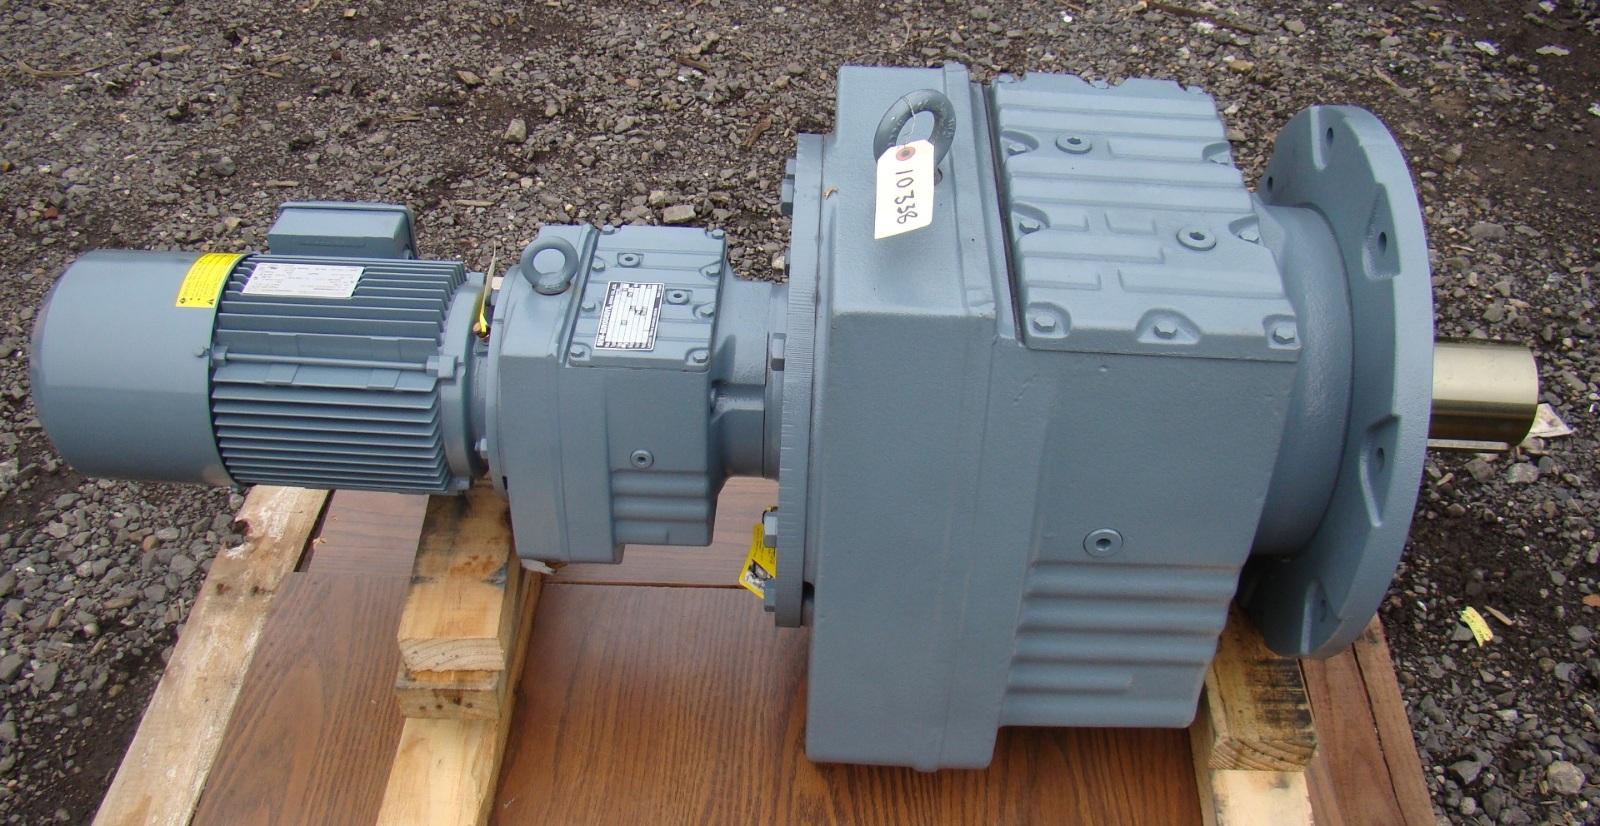 Sew Eurodrive 490 1 Gear Motor 2 2kw 240 480v Rf137 R77